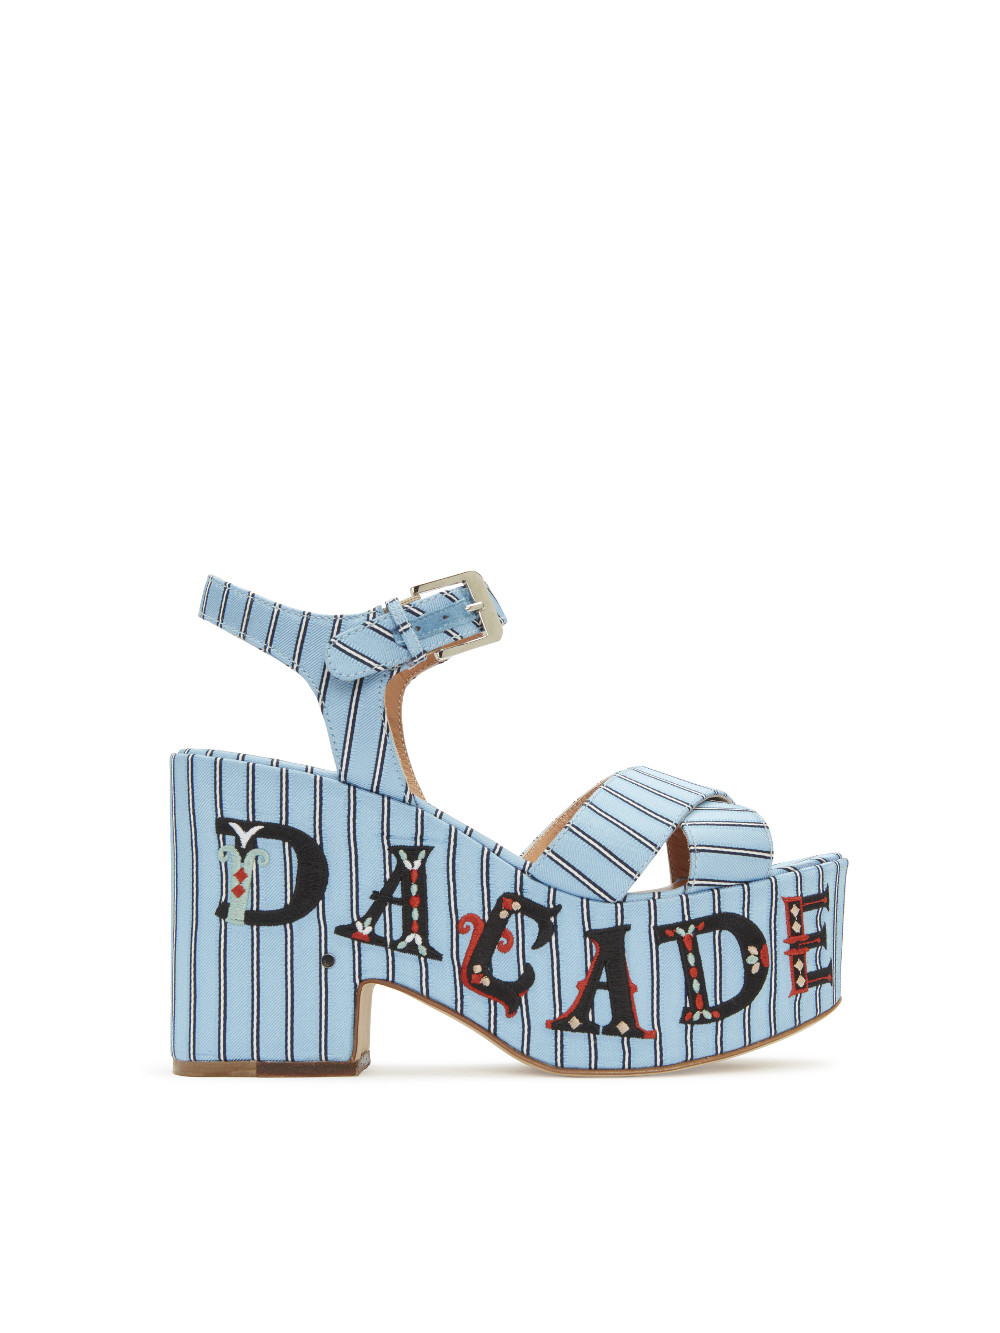 LD_SS19_Helissa Letters_Stripped Fabric_Celeste_0083.jpg